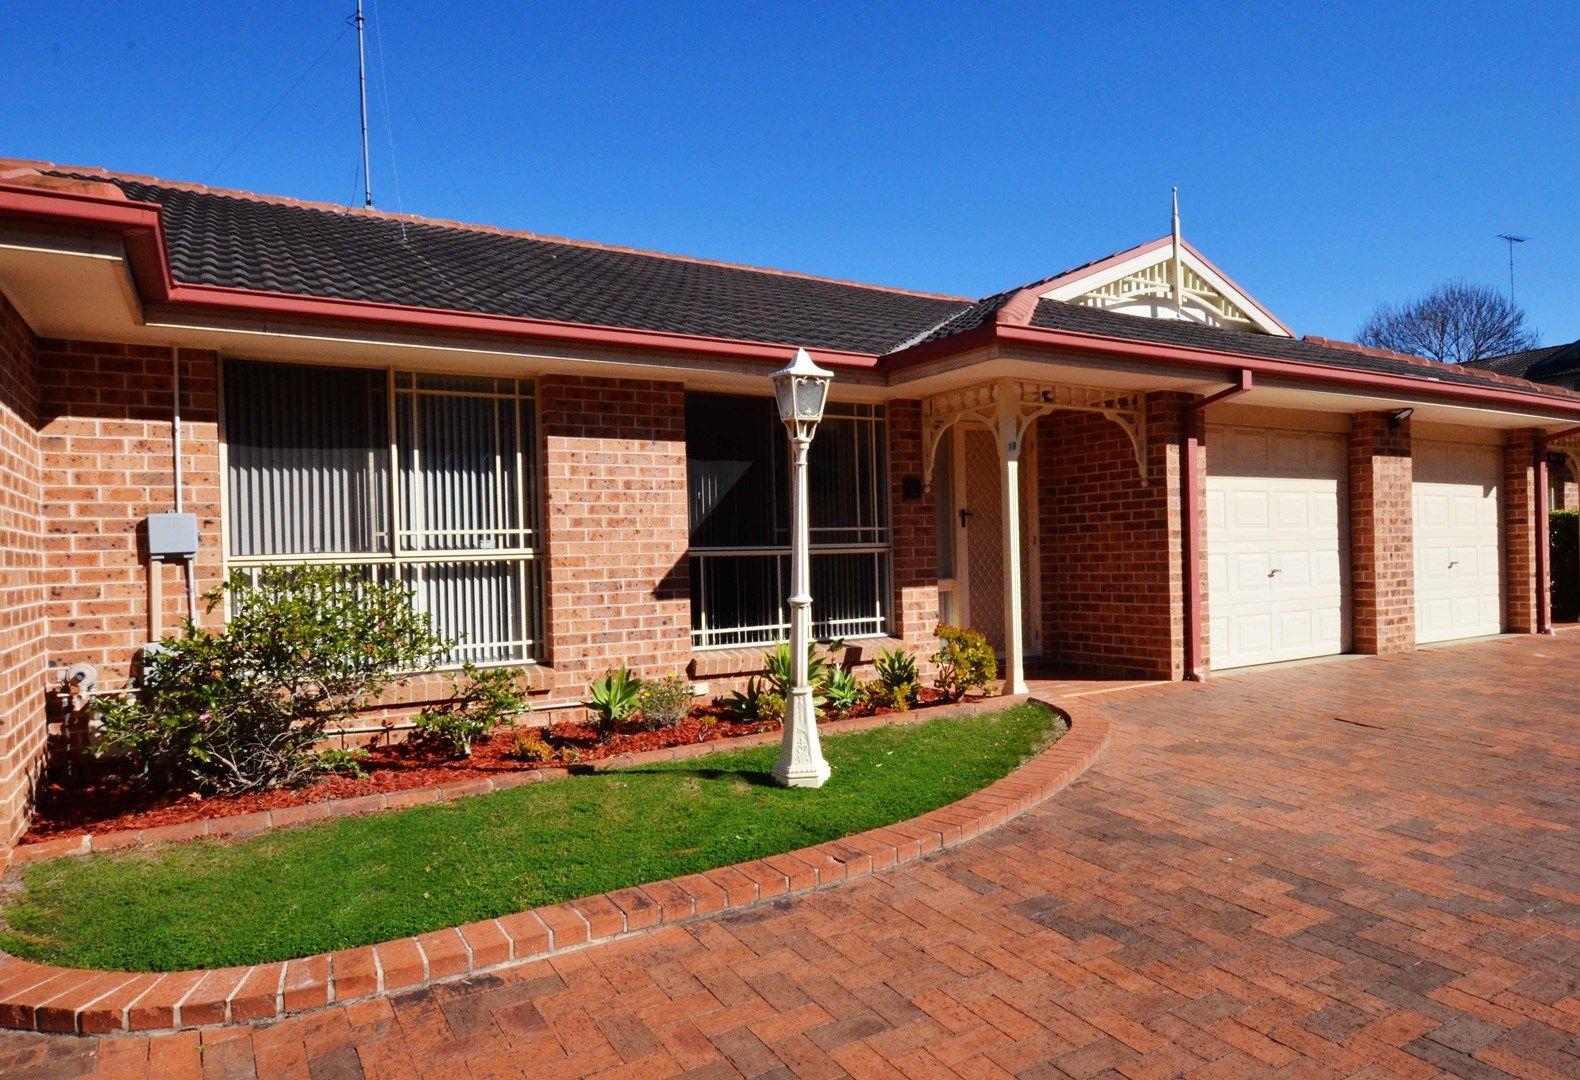 18/41 St Martins Cres, Blacktown NSW 2148, Image 0